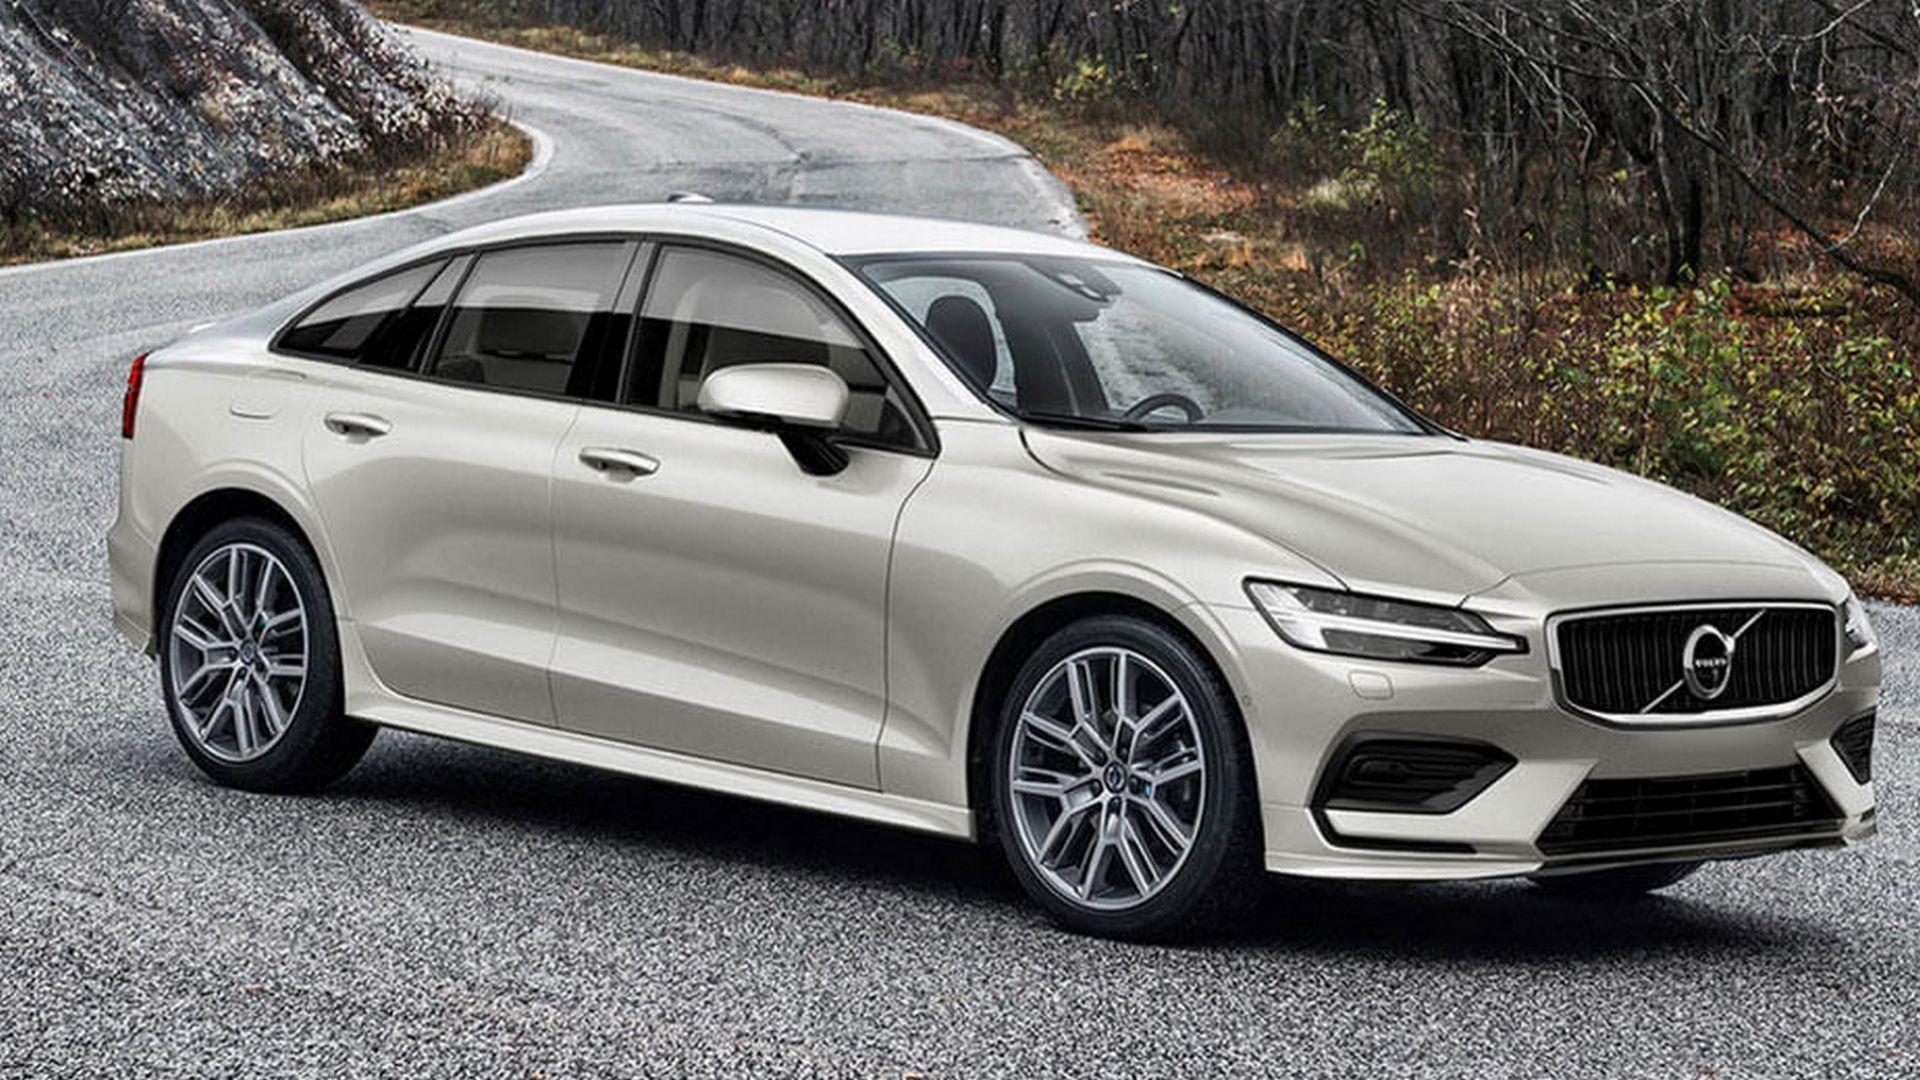 nuova volvo s60 2019 niente motori diesel solo benzina e ibrida motorbox. Black Bedroom Furniture Sets. Home Design Ideas